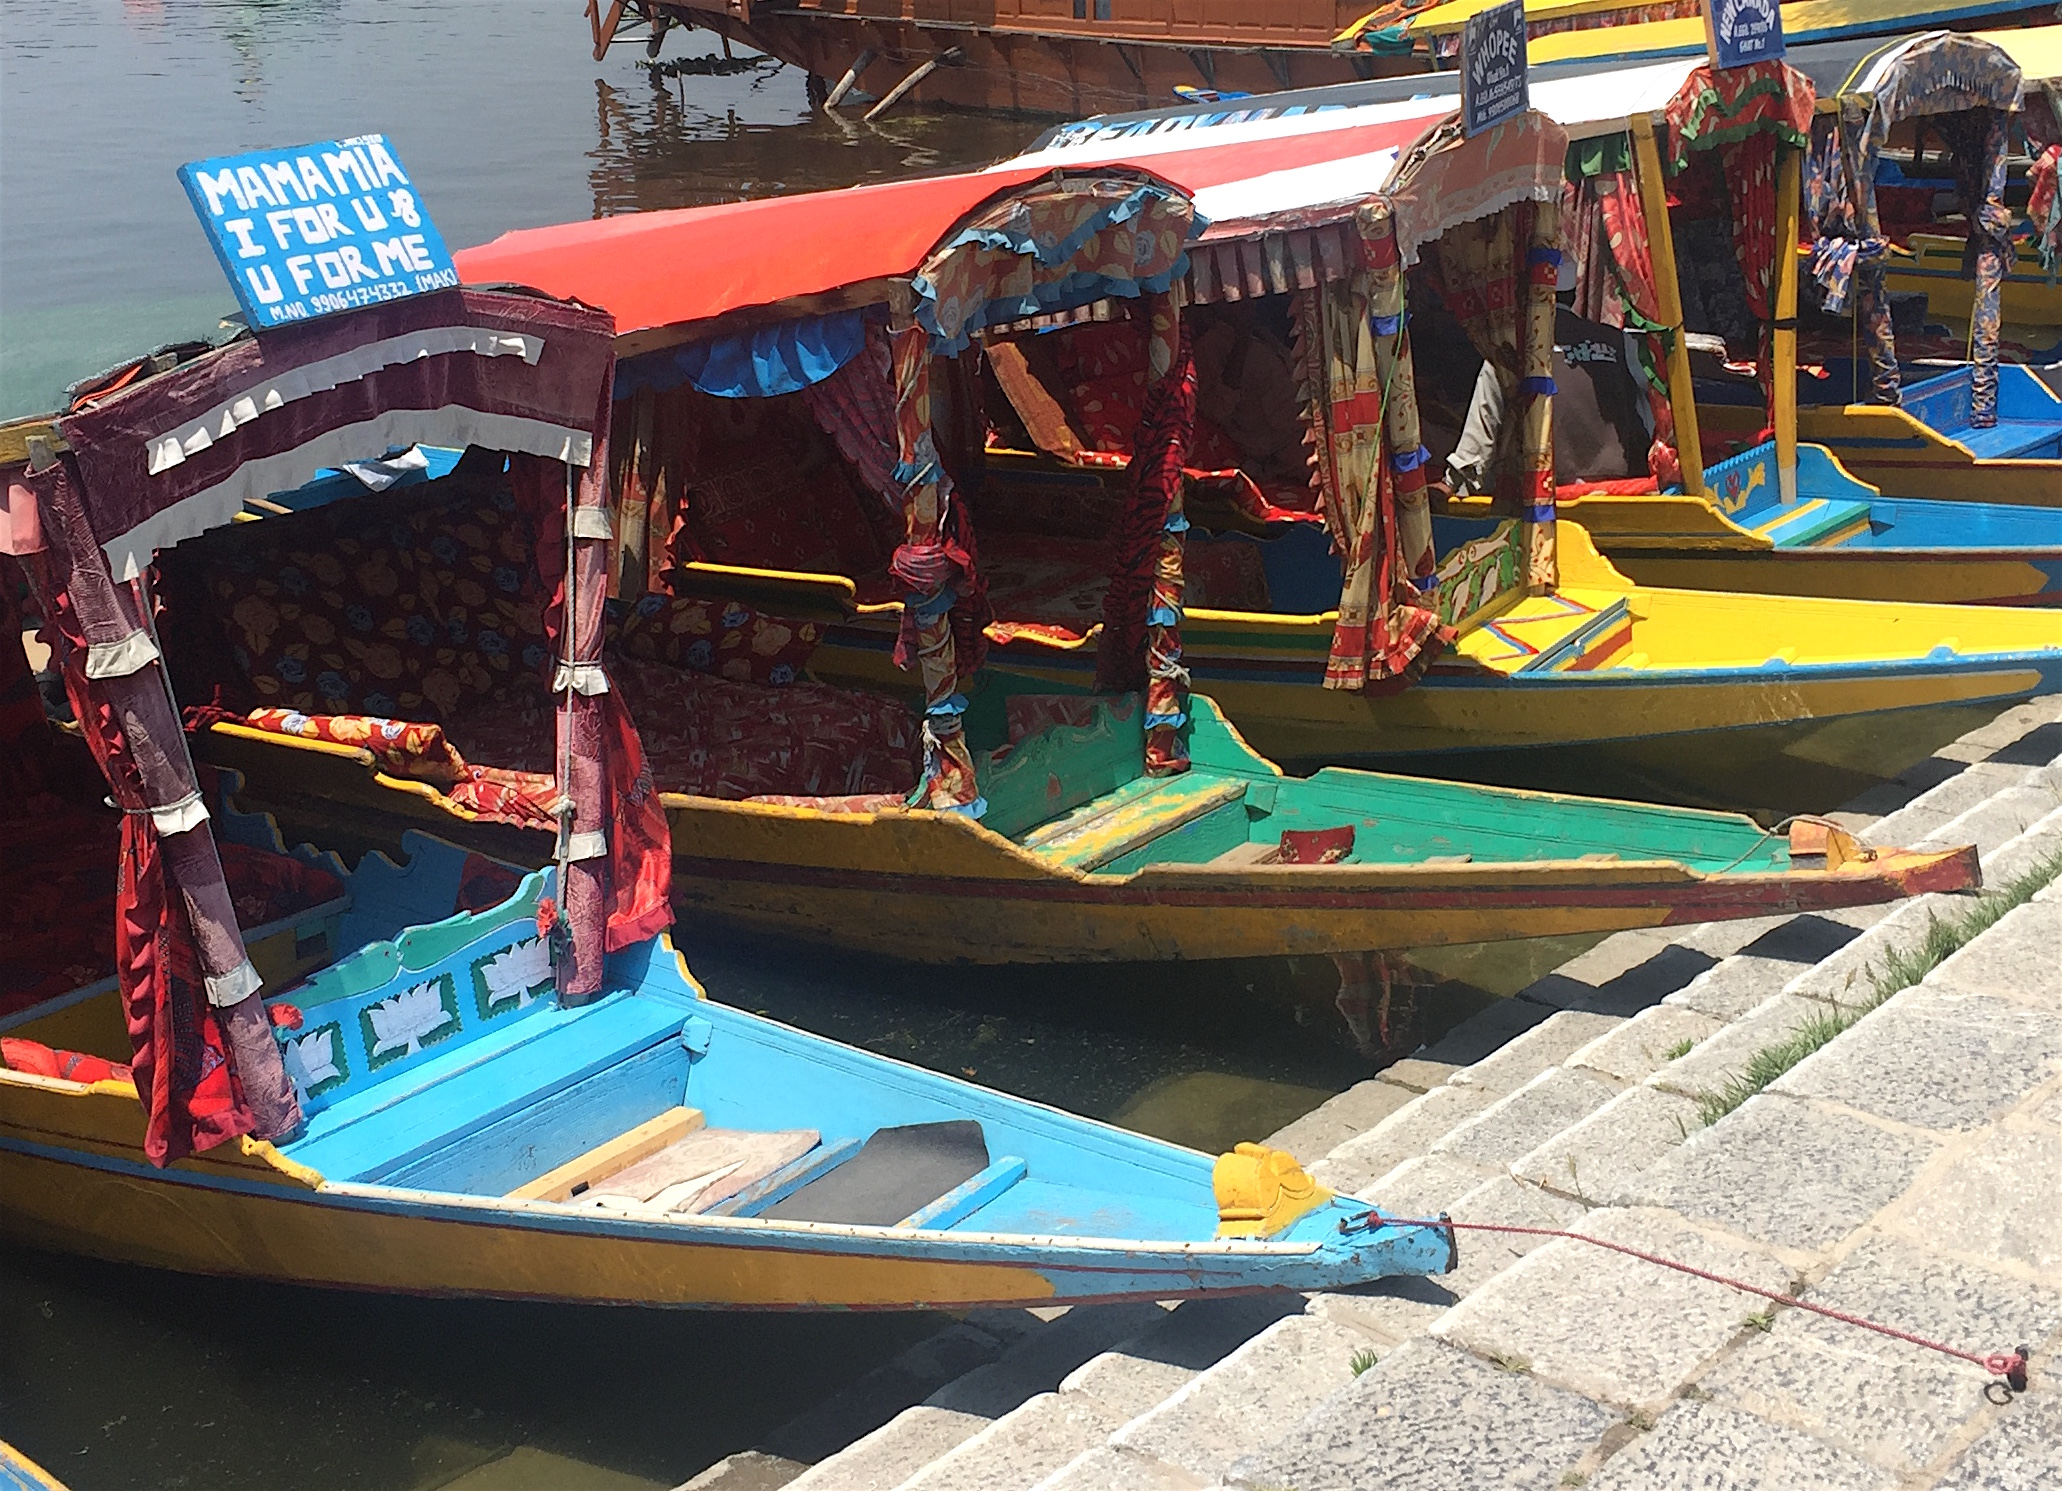 Shikaras docked at Nagin Lake